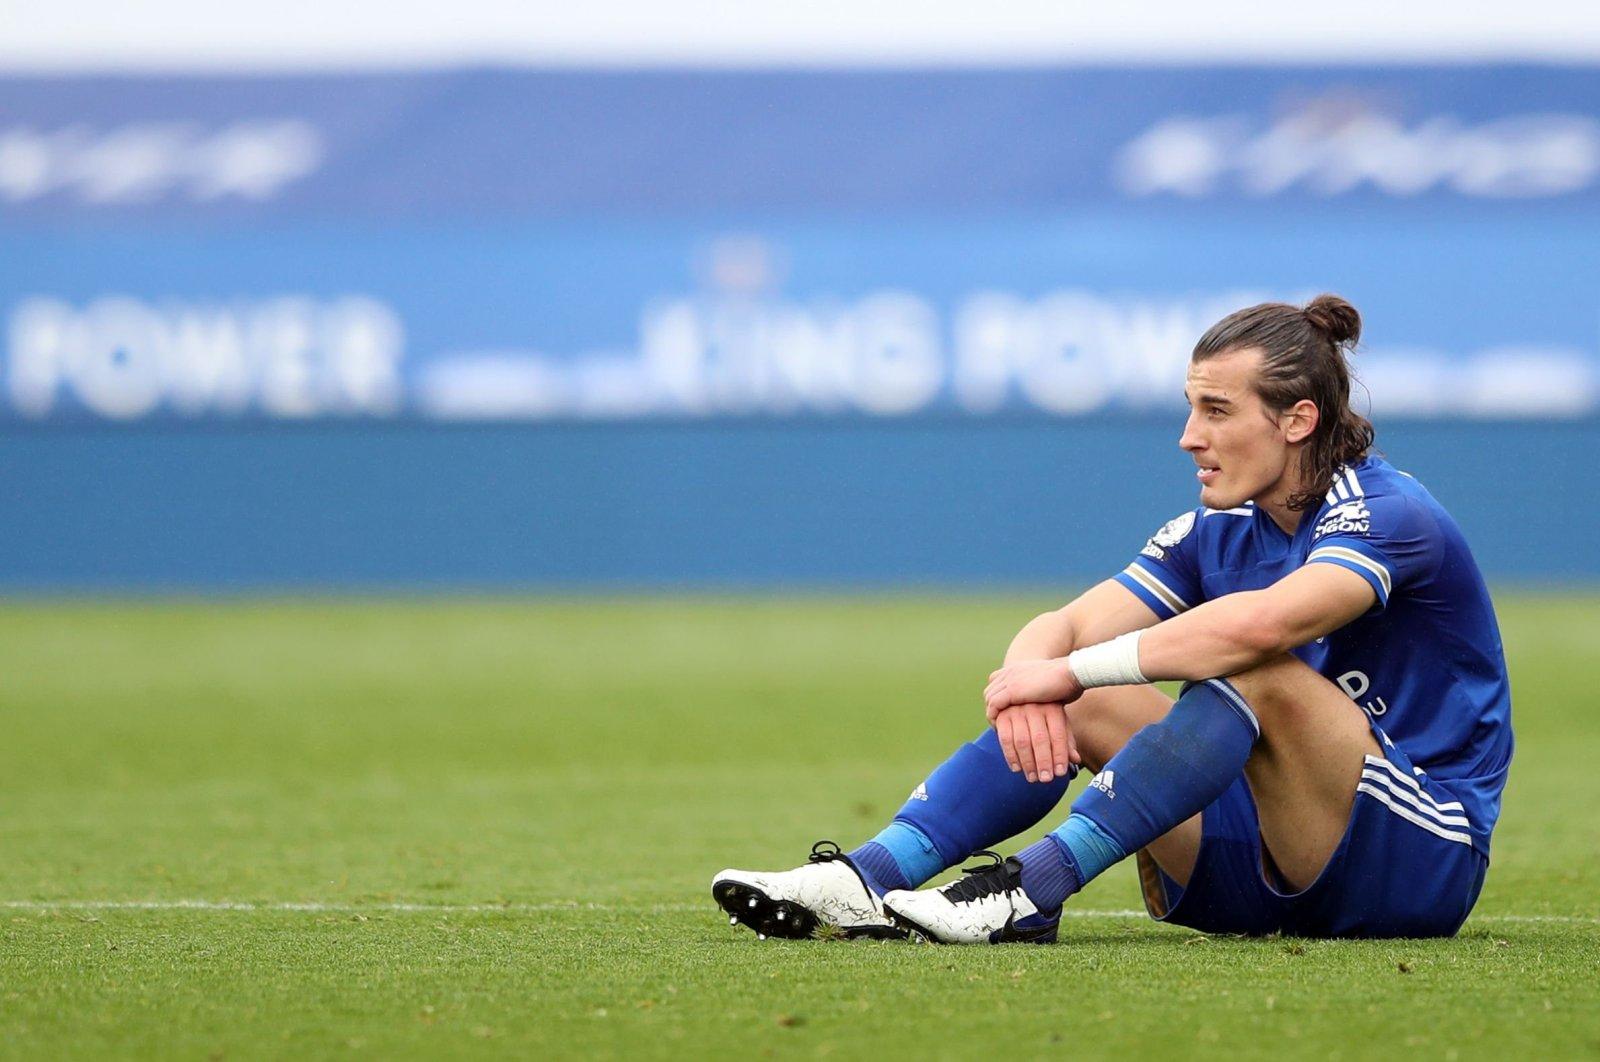 Leicester City's Çaglar Söyüncü reacts after a Premier League match, in Leicester, England, Oct. 4, 2020. (AFP Photo)